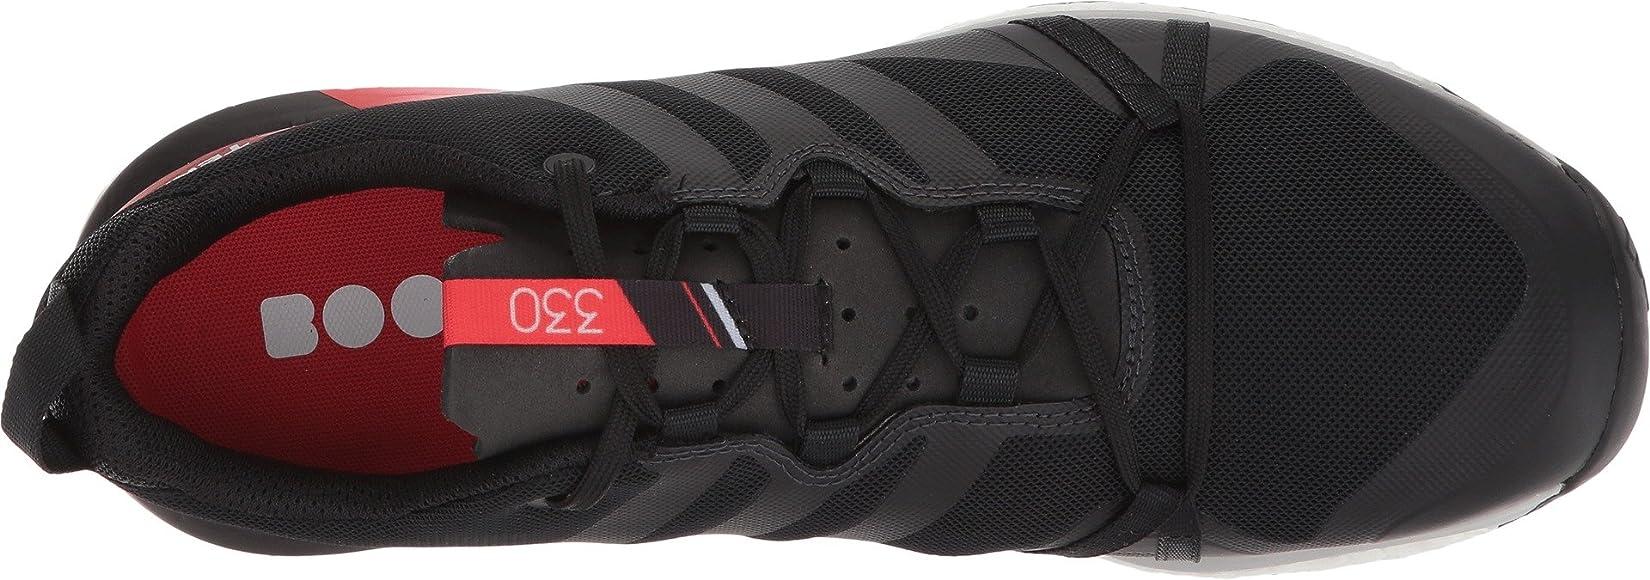 adidas Men's Terrex Agravic Shoe (10.5